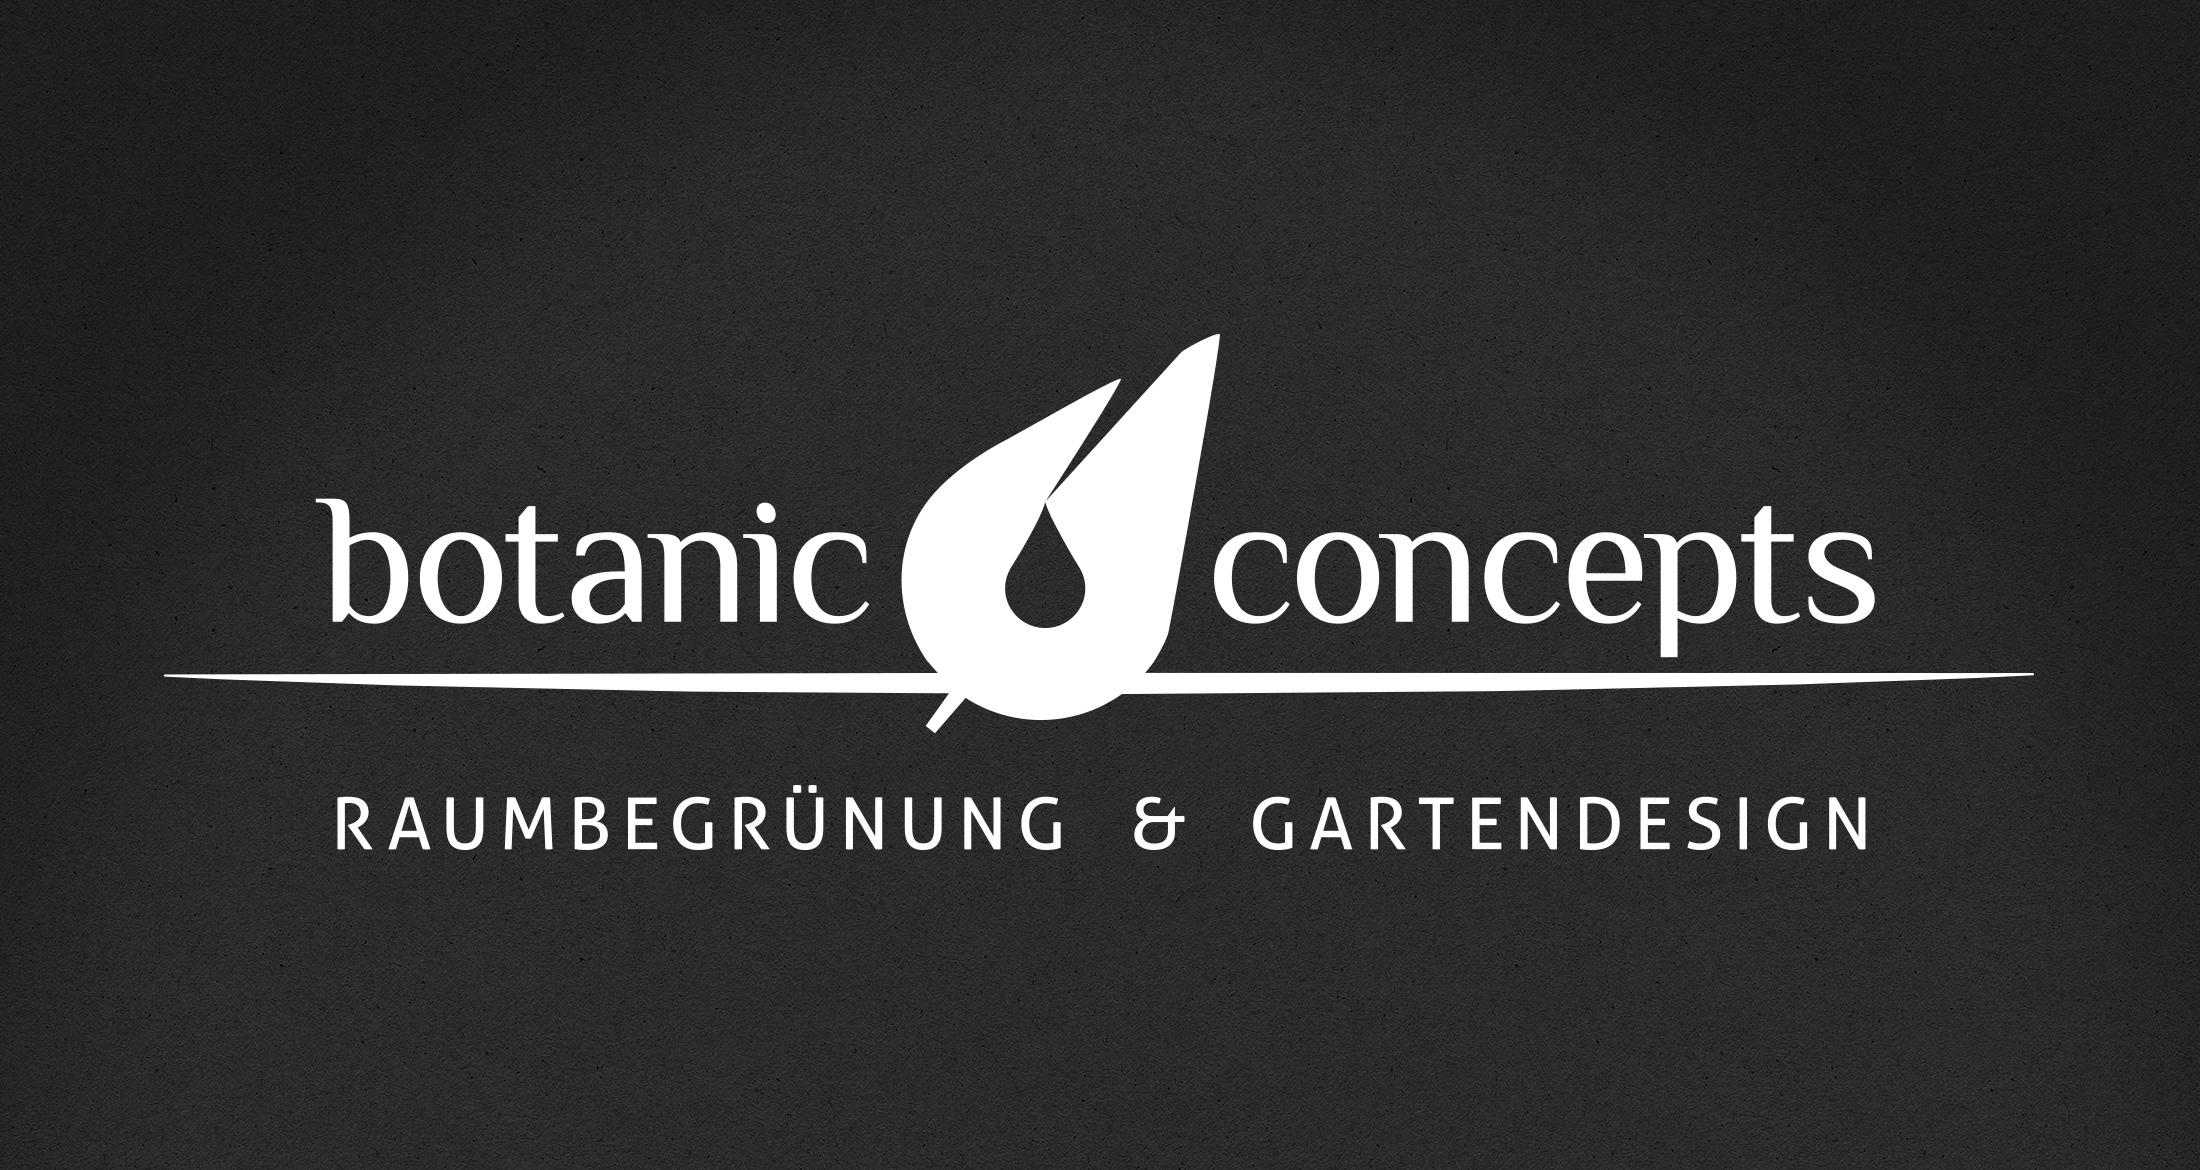 Logo botanic concepts, Dannenfels, 1-farbig weiß